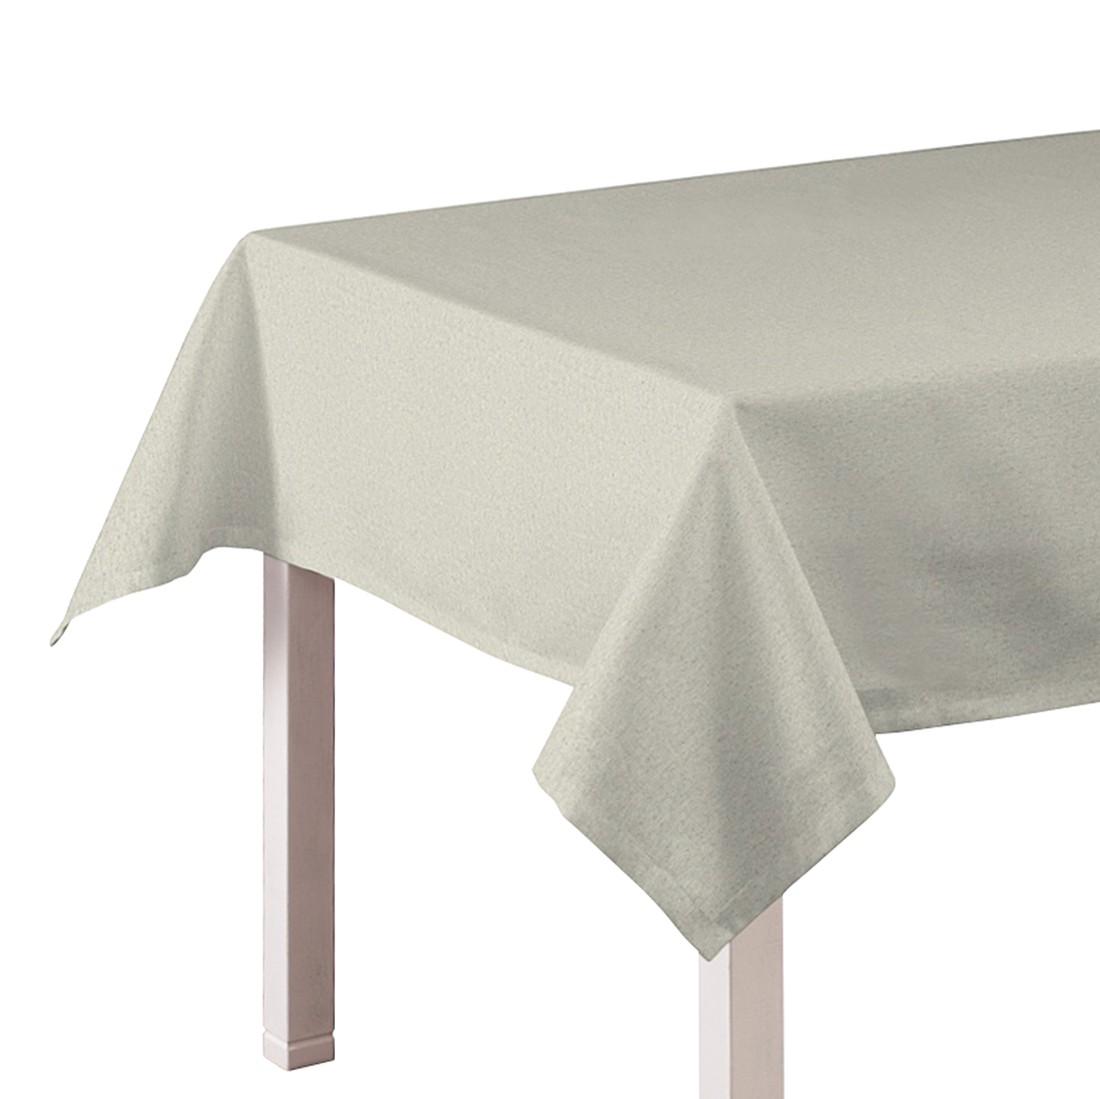 Tafelkleed Loneta - Grijs/lichtgrijs - 130x180cm, Dekoria